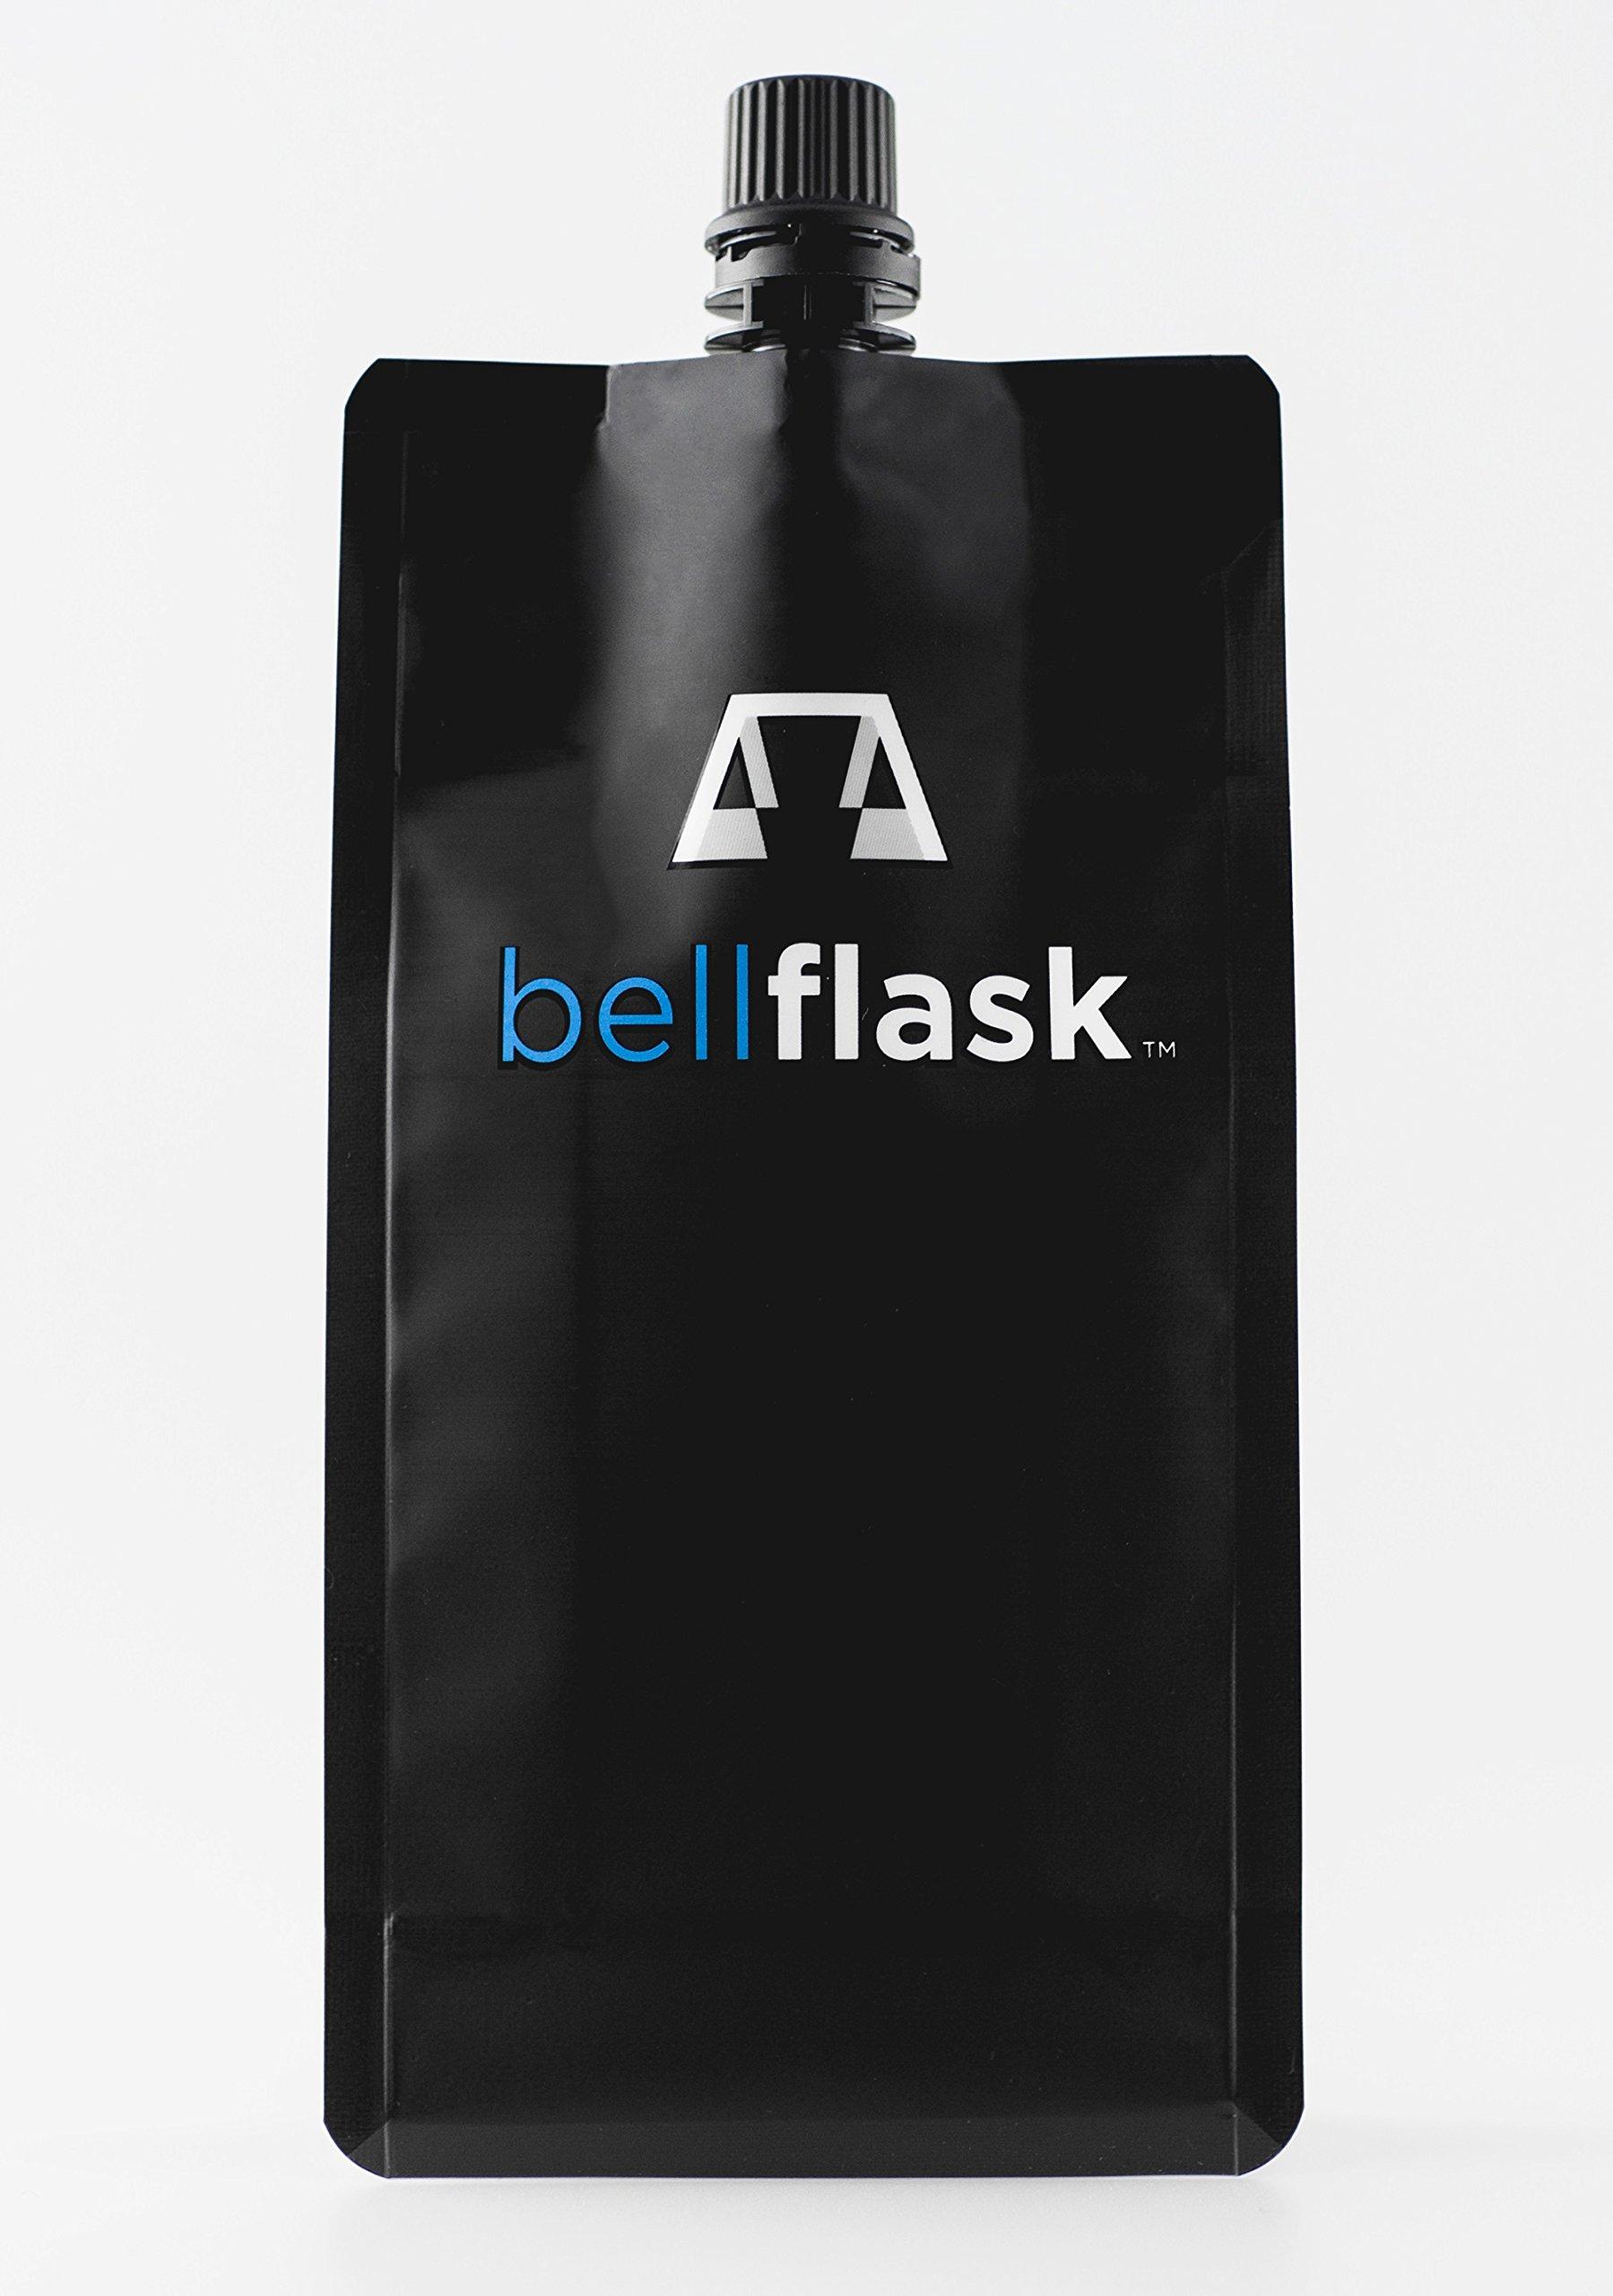 BellFlask - 12 oz. Concealable, Flexible, Reusable, Best, Metal-Free Pack of Five Flasks by BellFlask